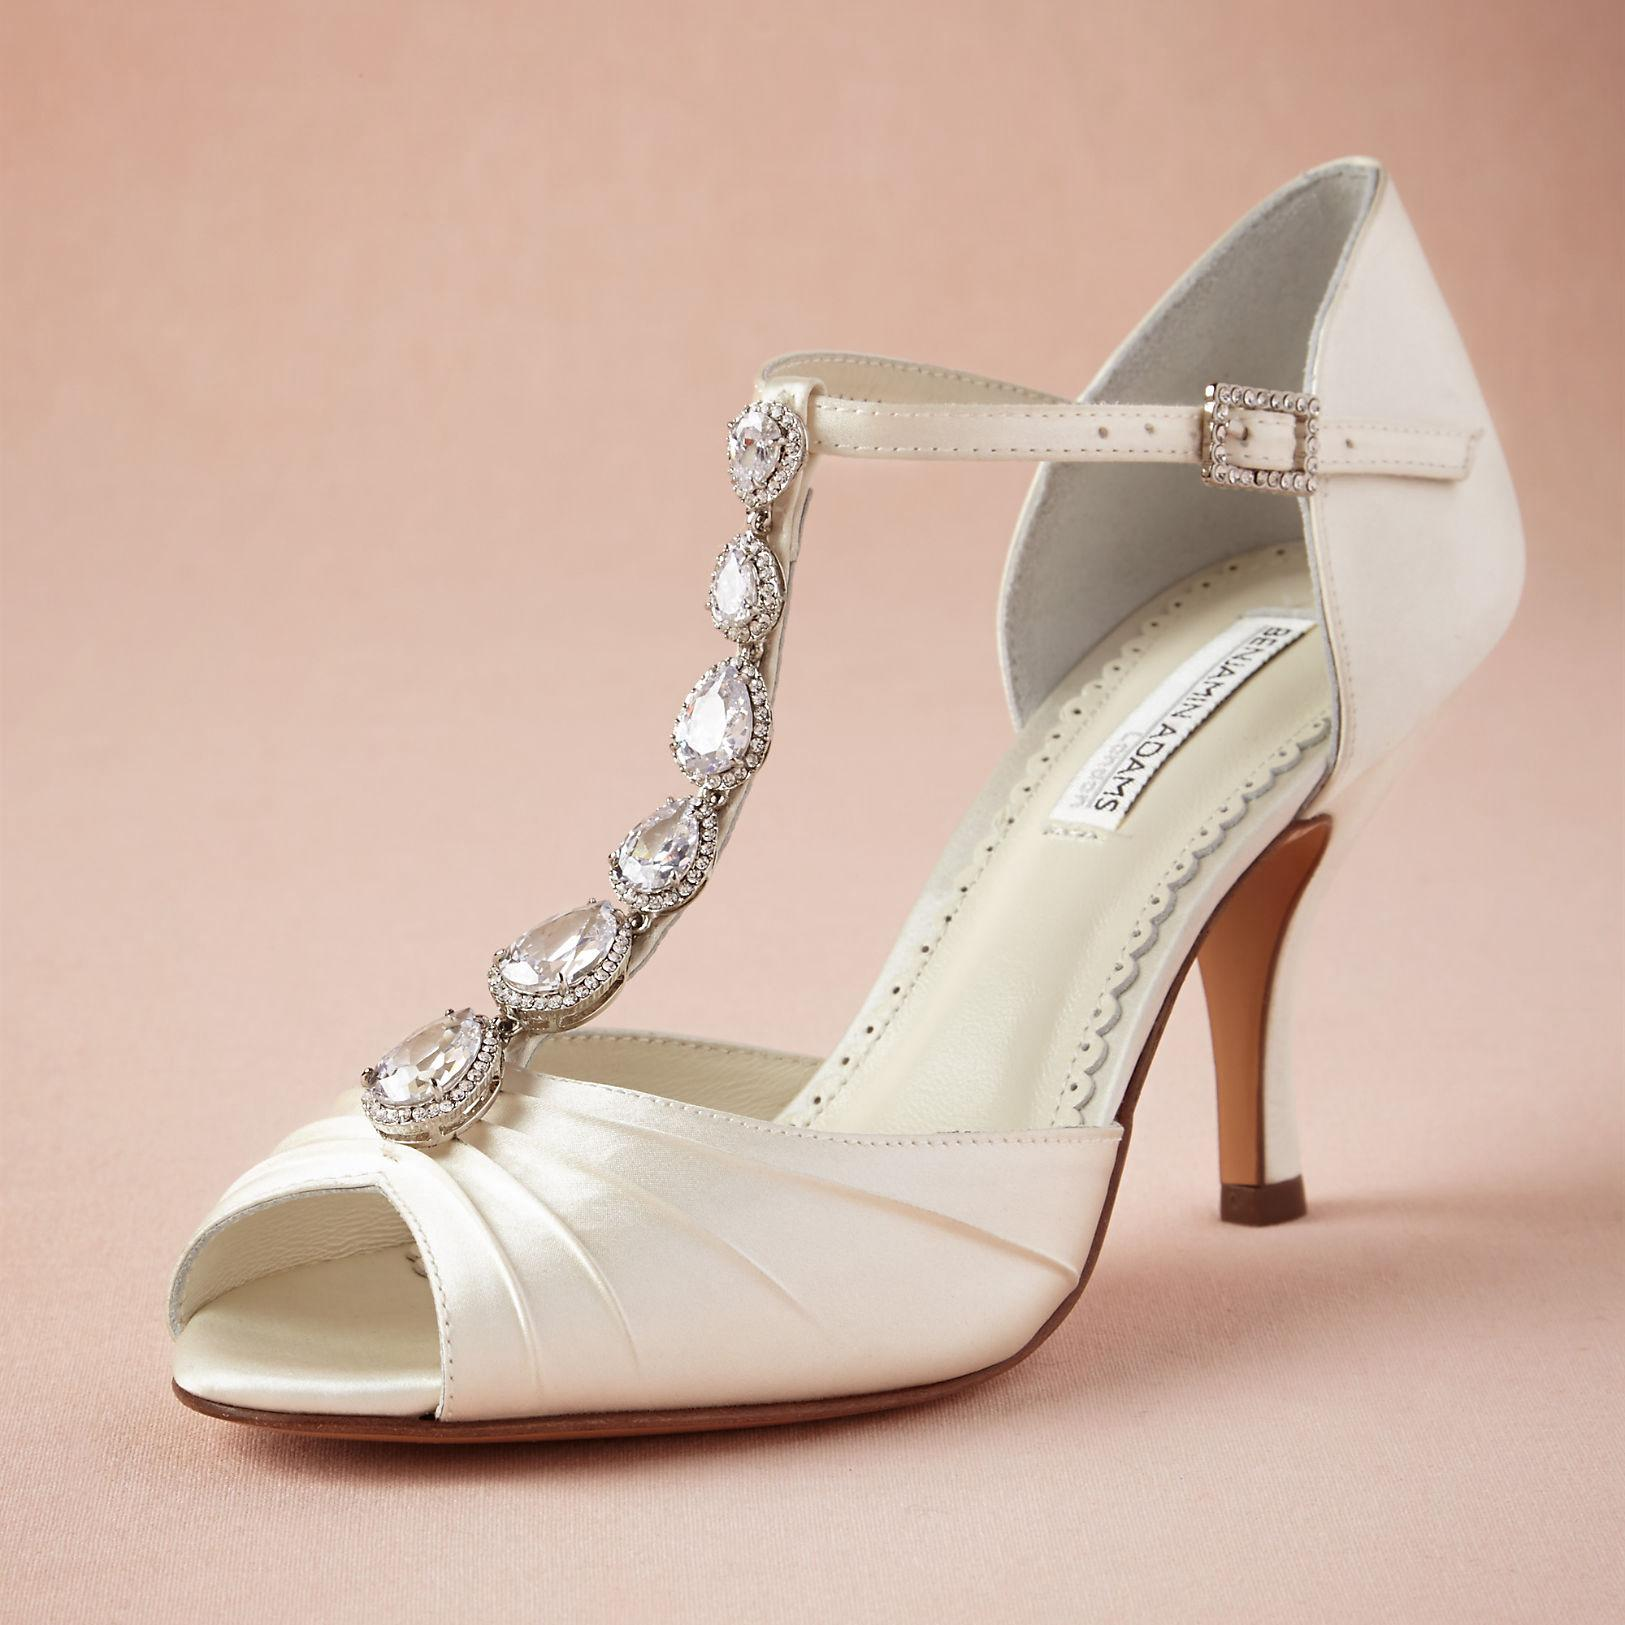 Vitange Satin Wedding Shoes Handmade Leather Pumps T Straps